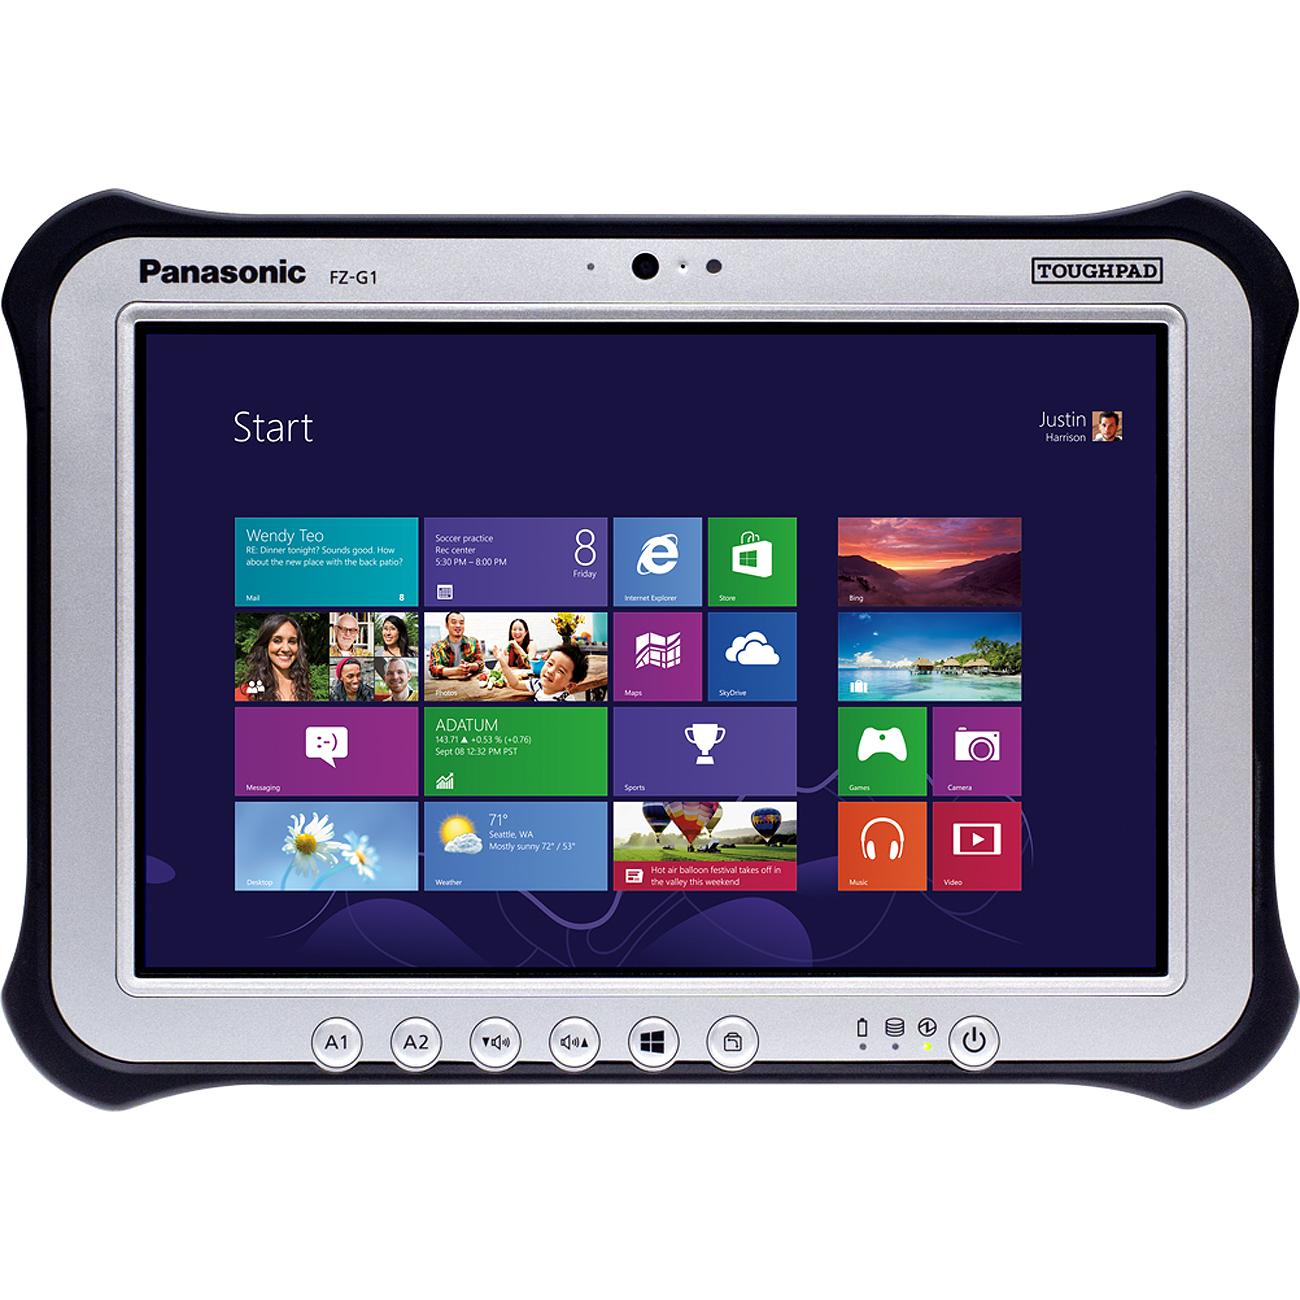 Panasonic Toughpad FZ-G1AABCXMV Tablet - 10 1